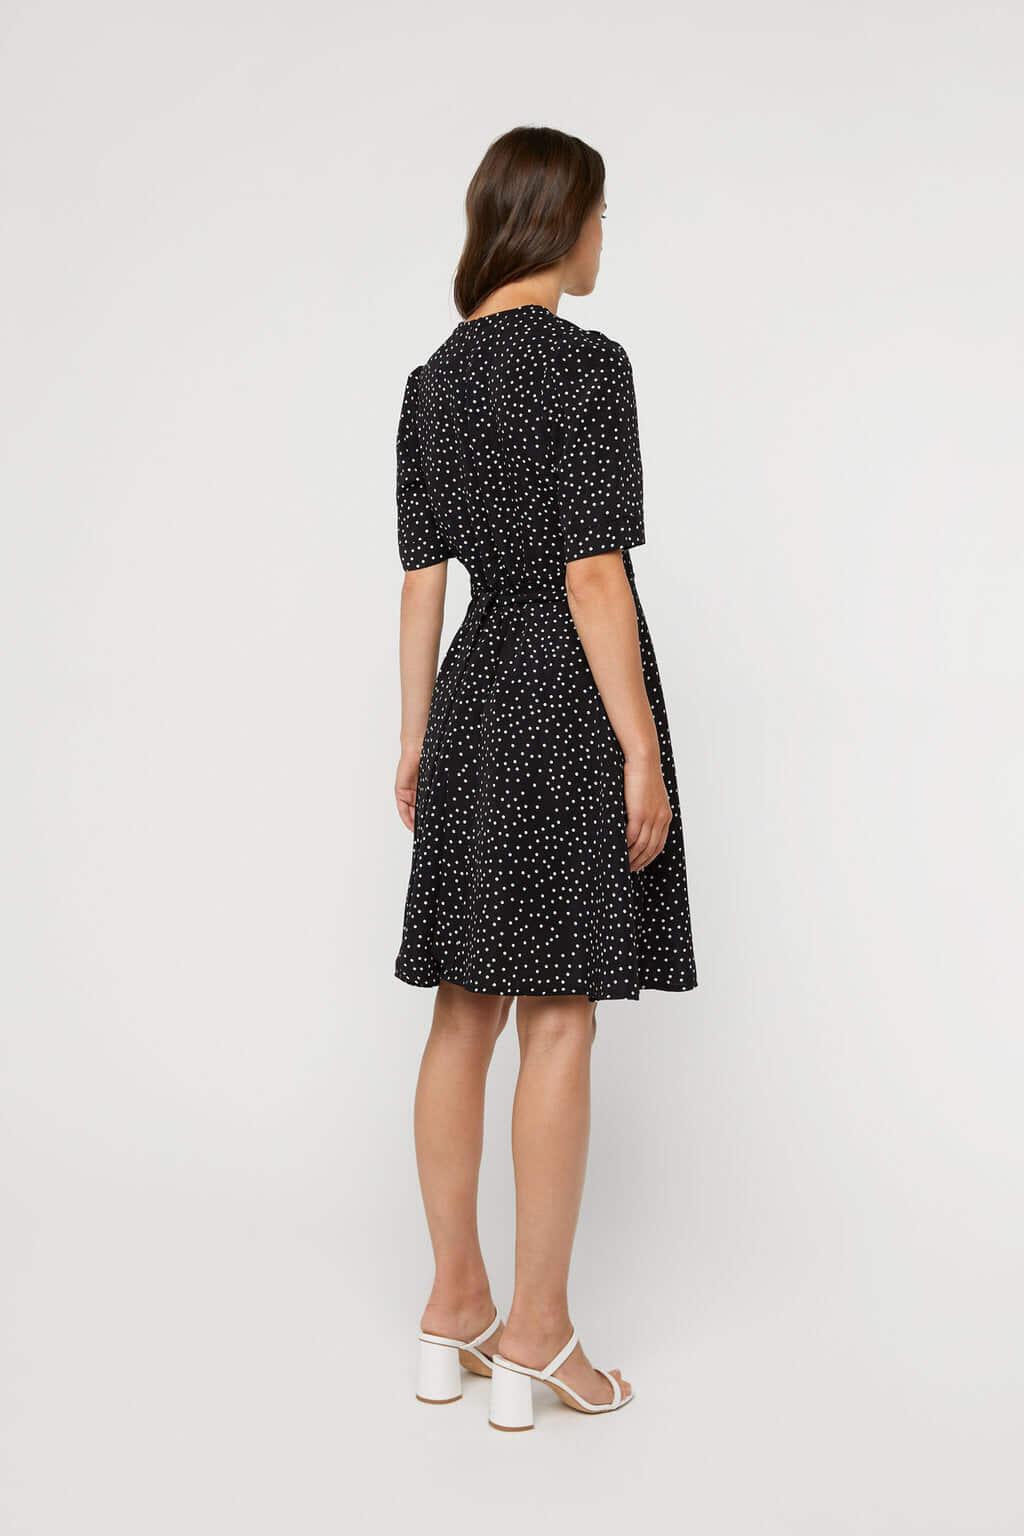 Dress K026 Black 4